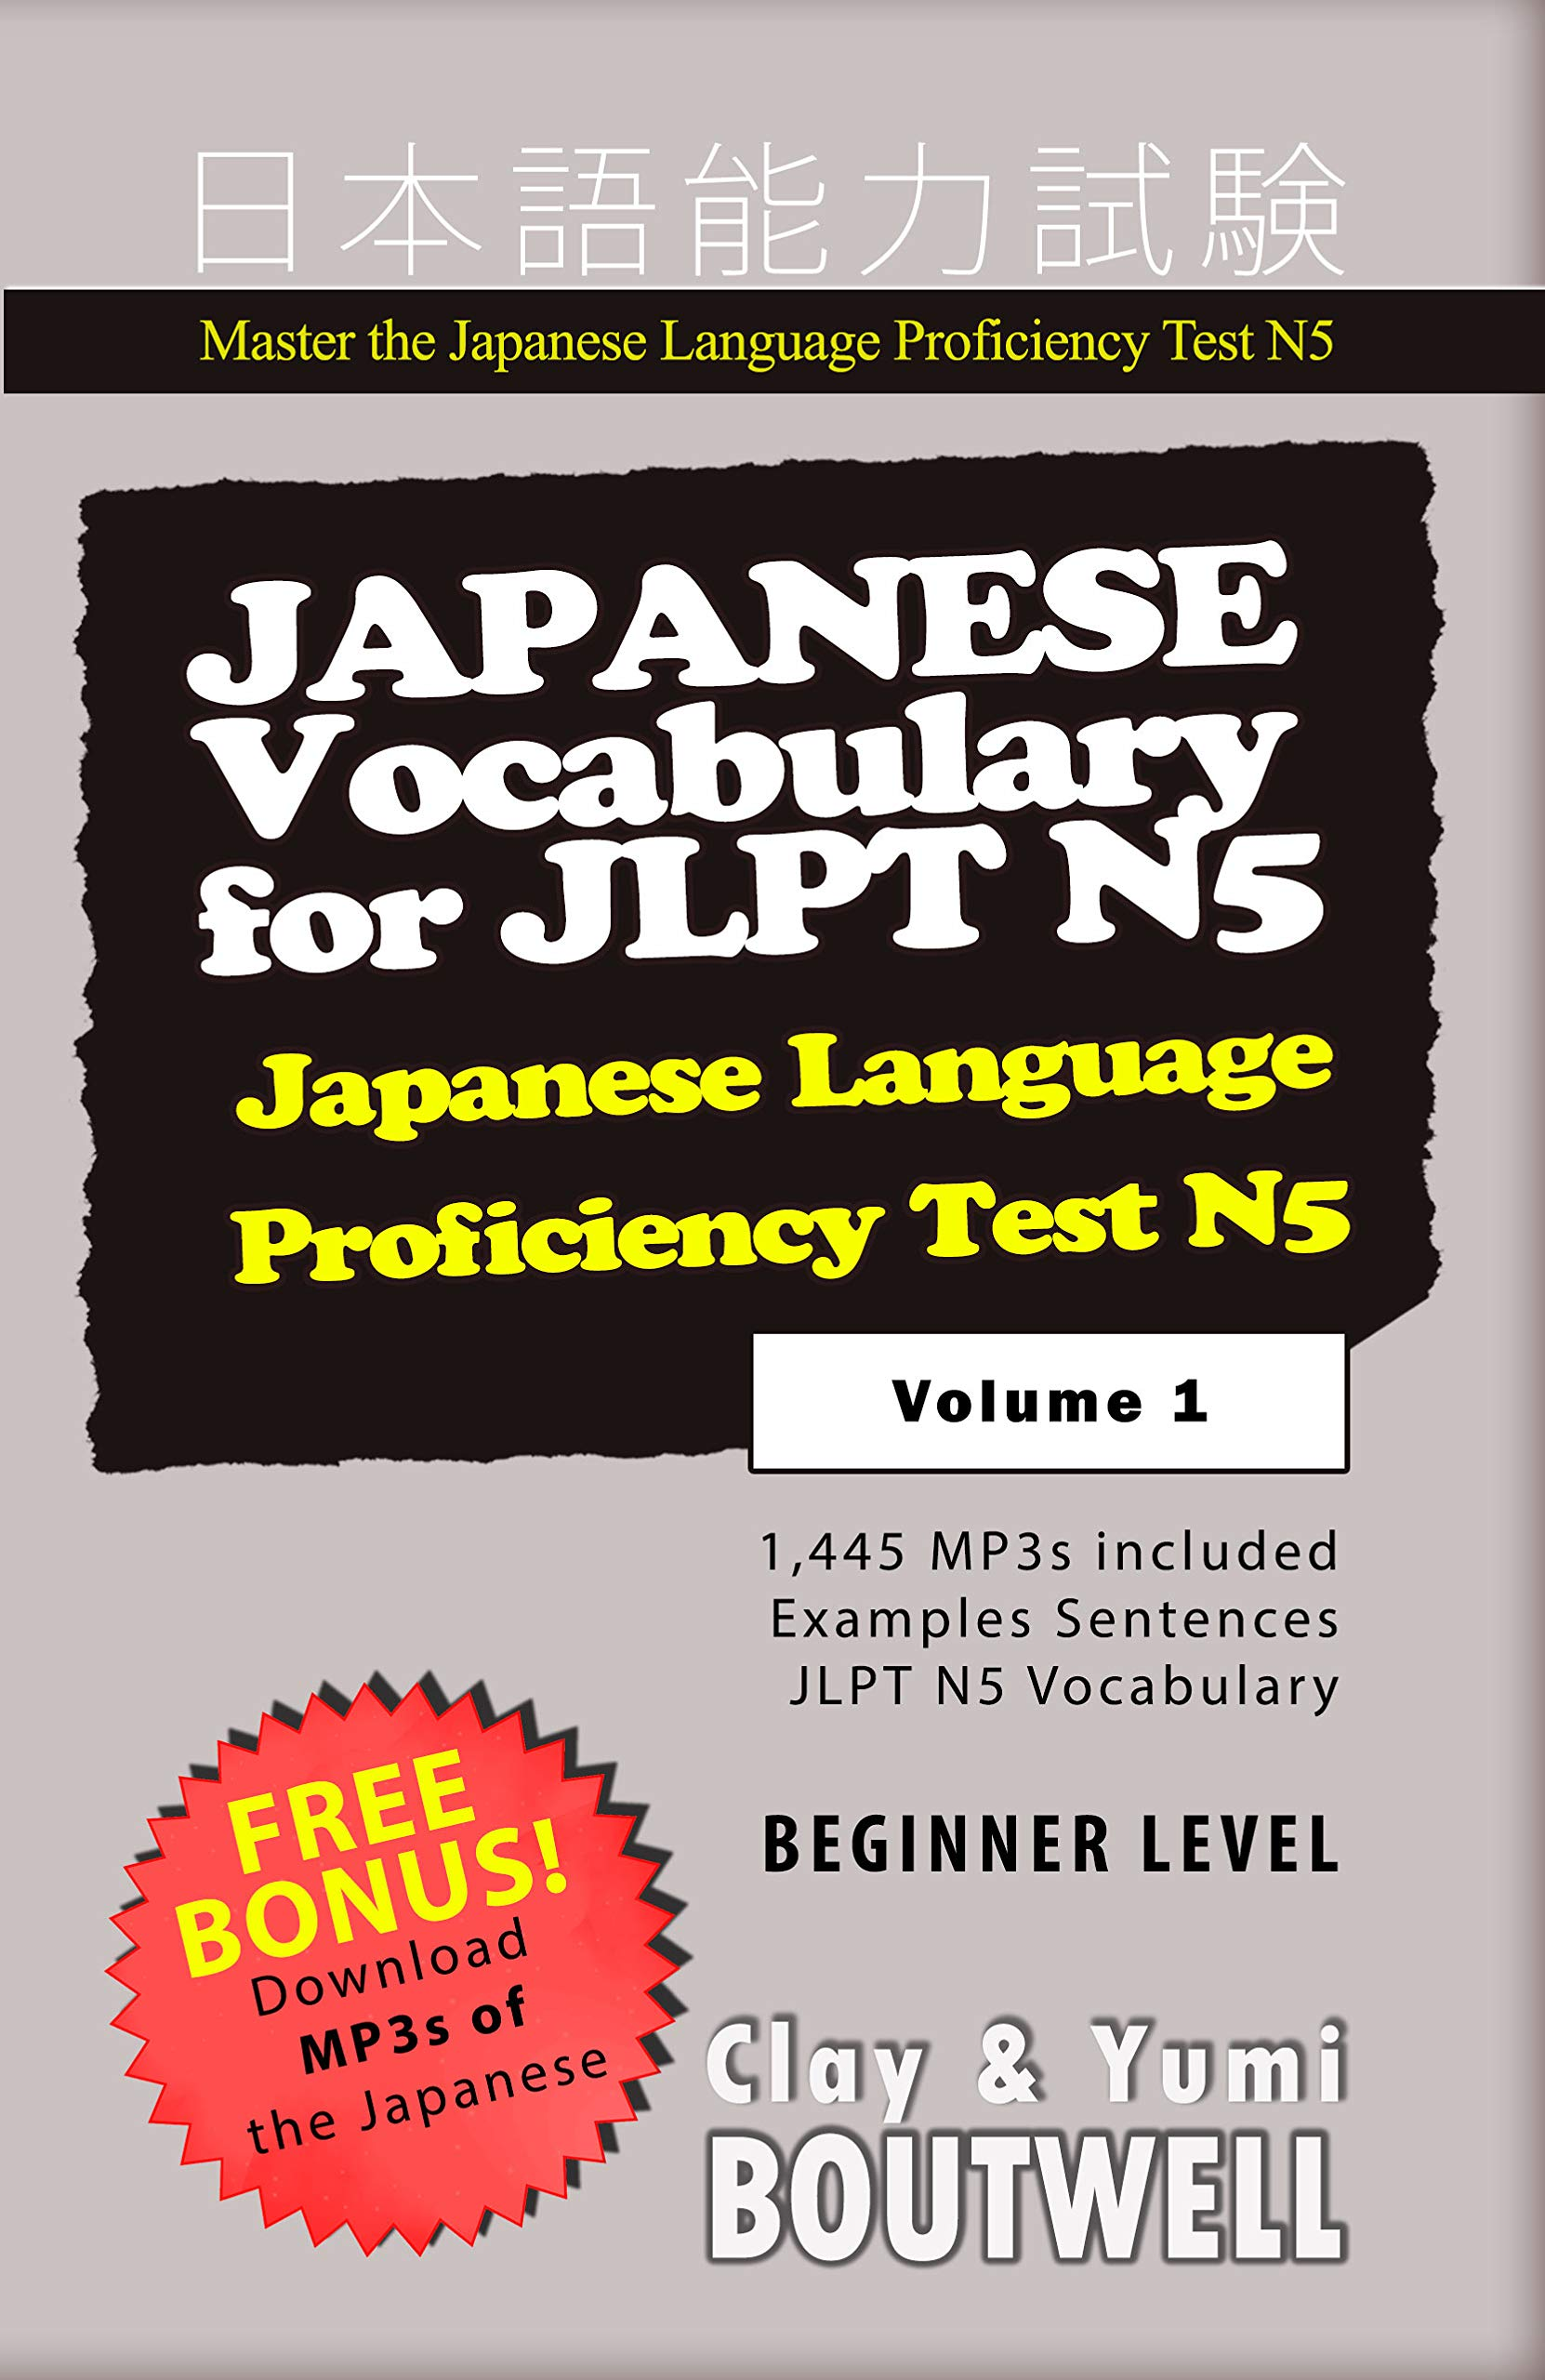 Japanese Vocabulary for JLPT N5: Master the Japanese